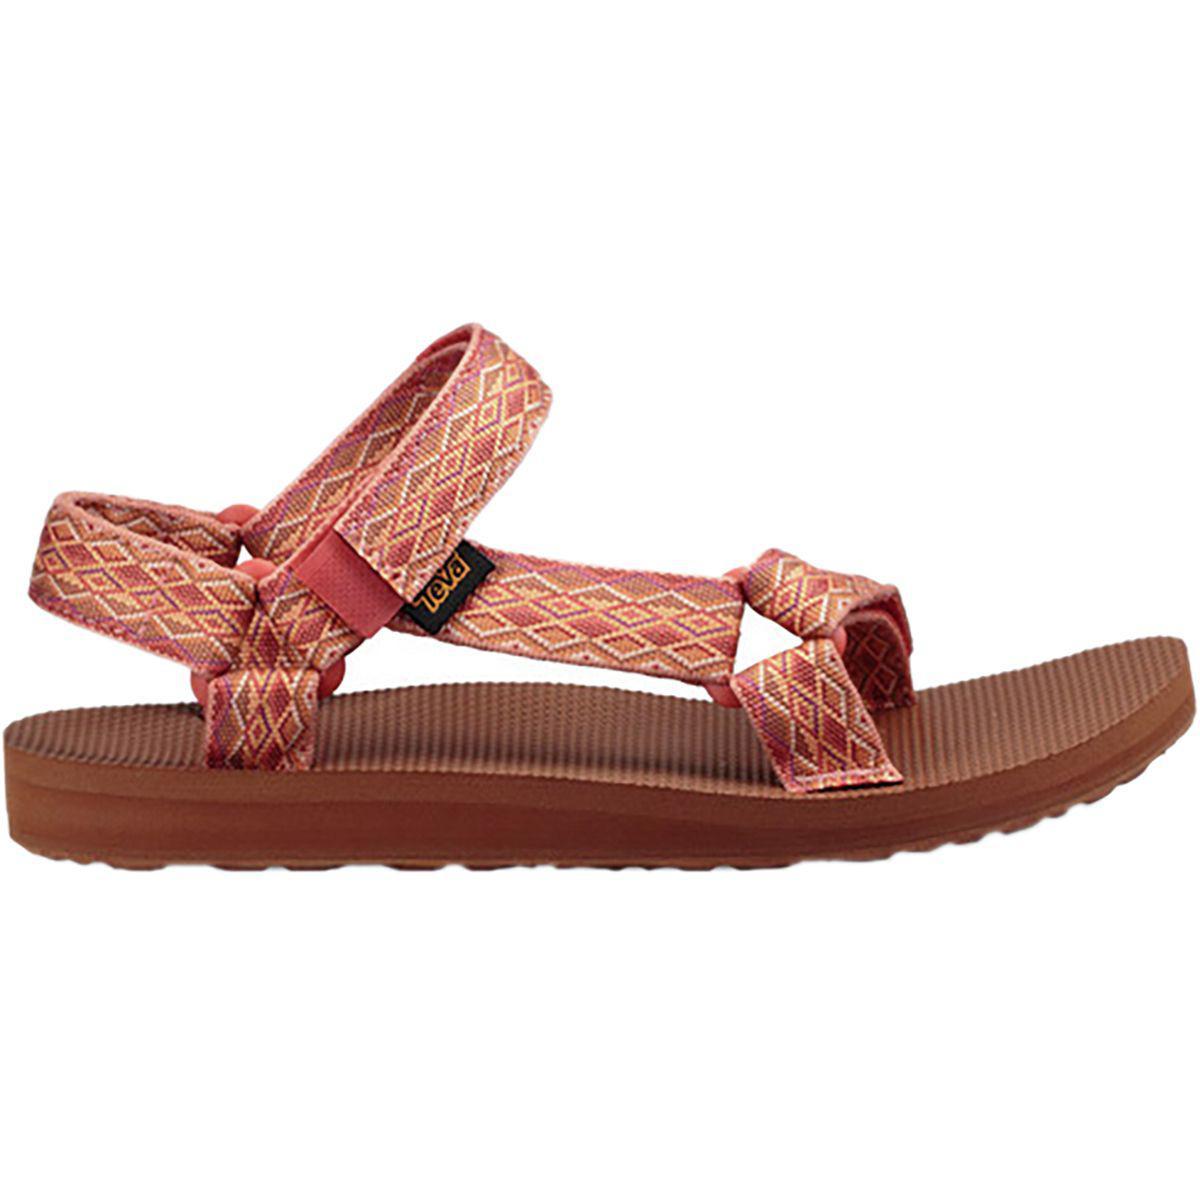 Original Universal Sandal - Lyst